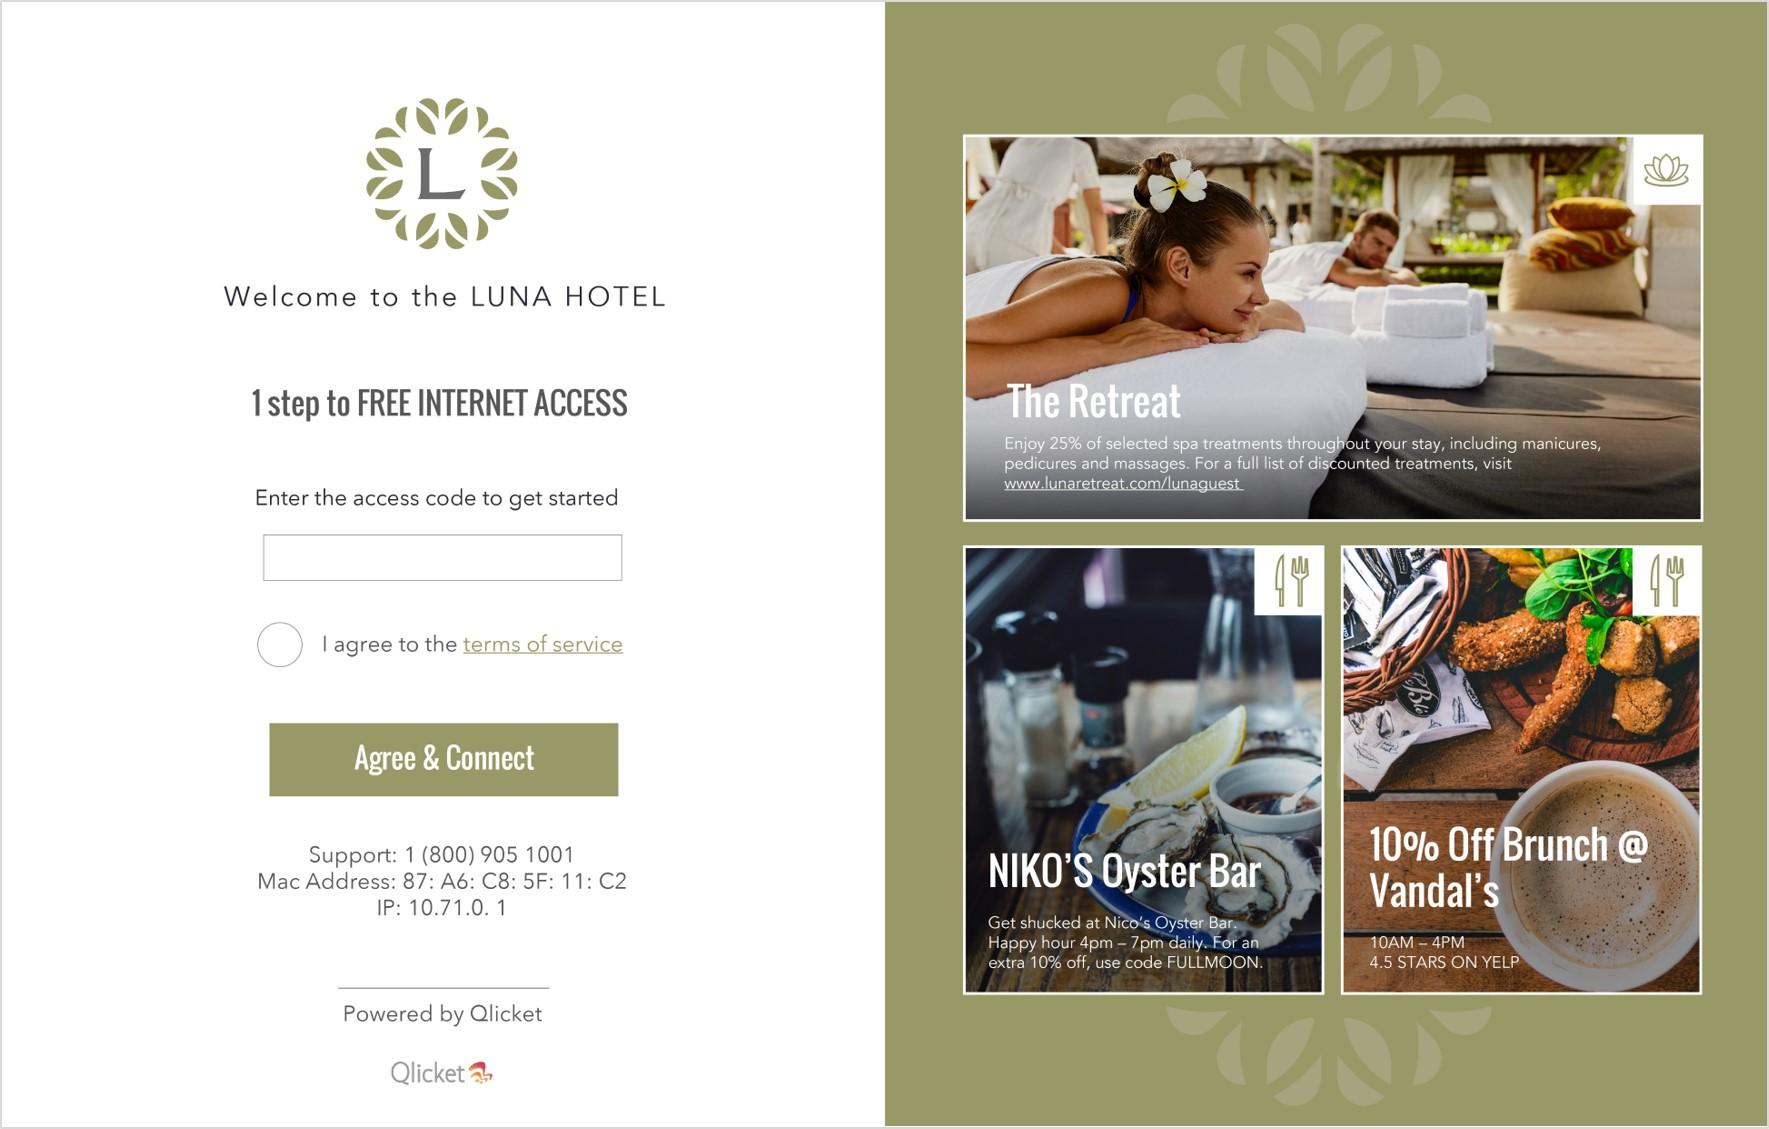 Luna Hotel WiFi Login Page